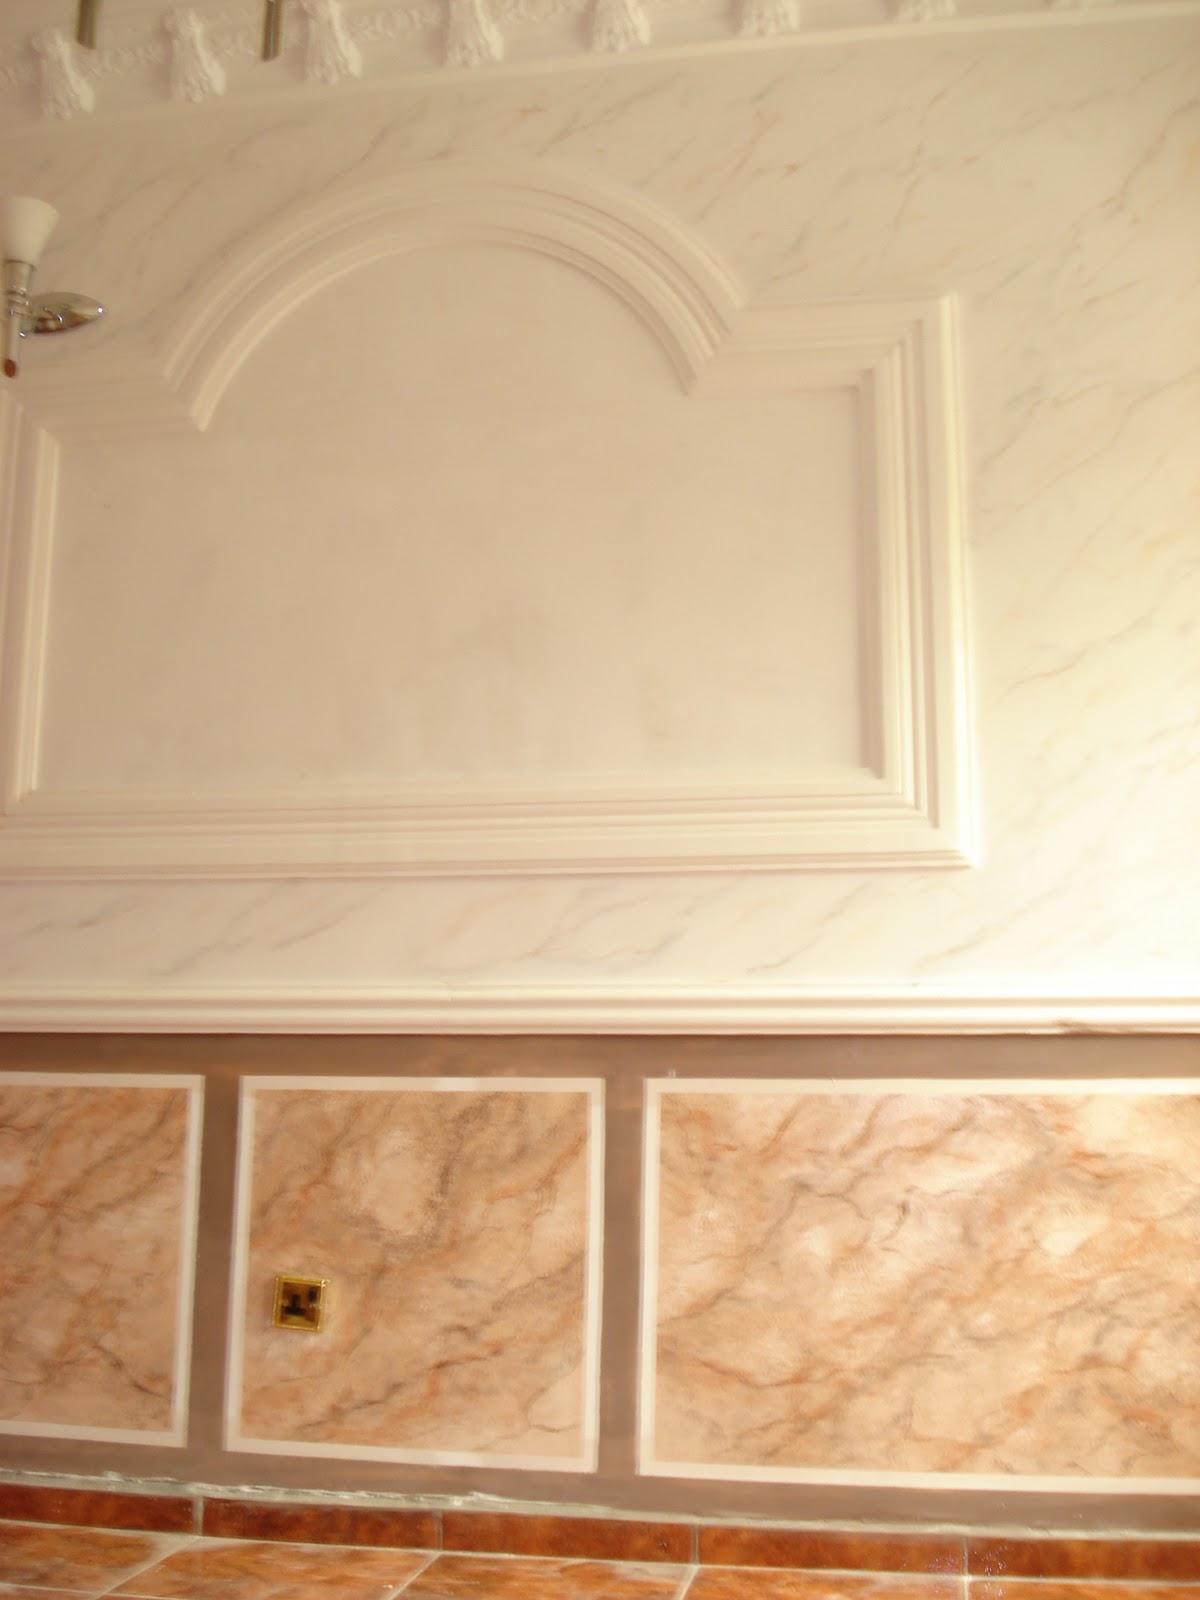 Sunday, November 28, 2010. Design On Plaster Of Paris Ceiling